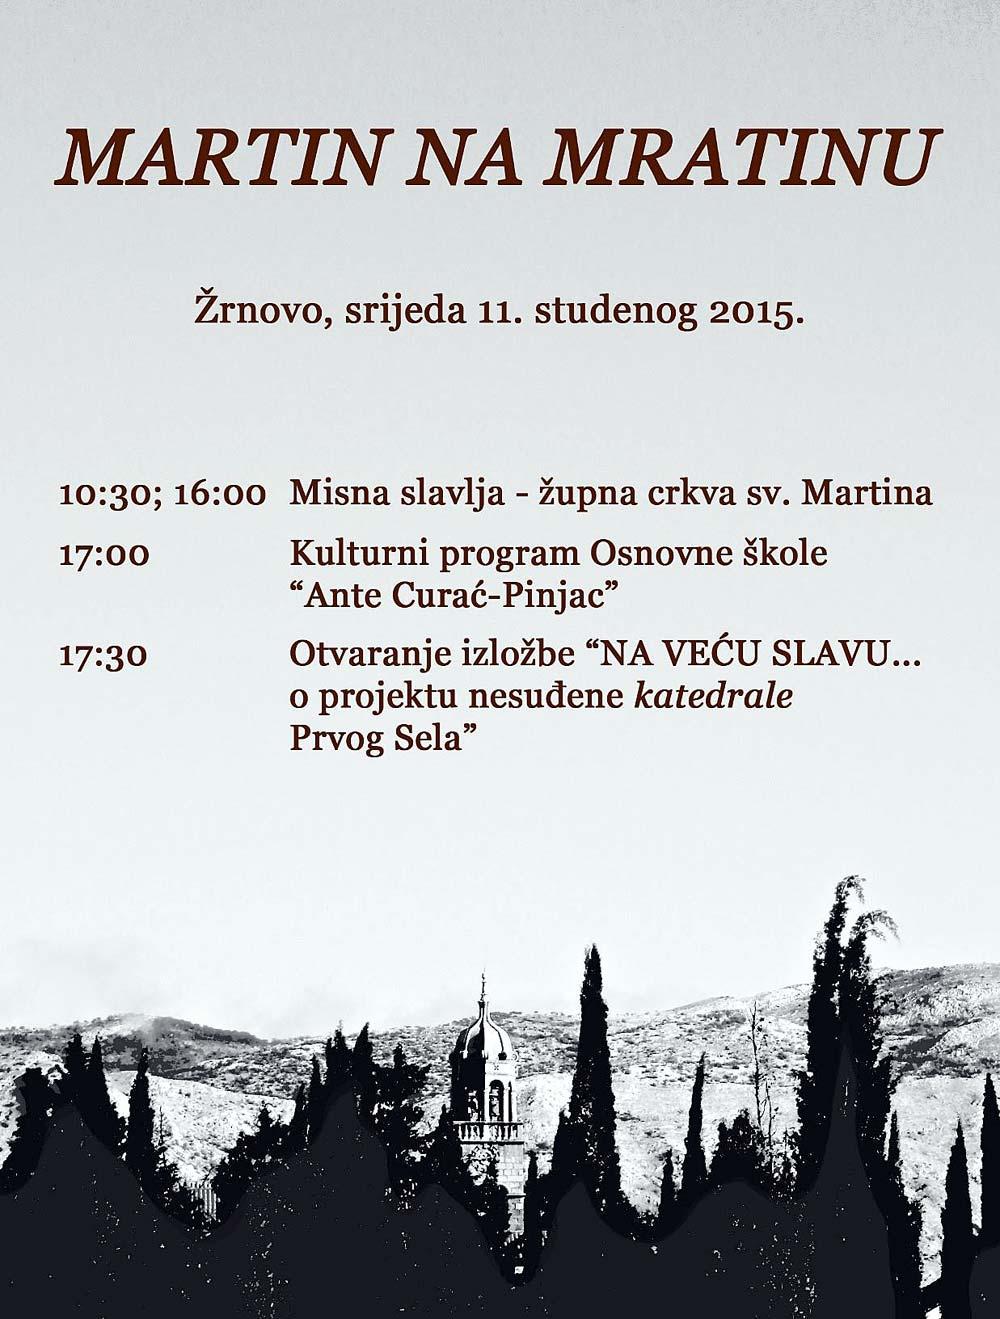 martin-na-mratinu2015a